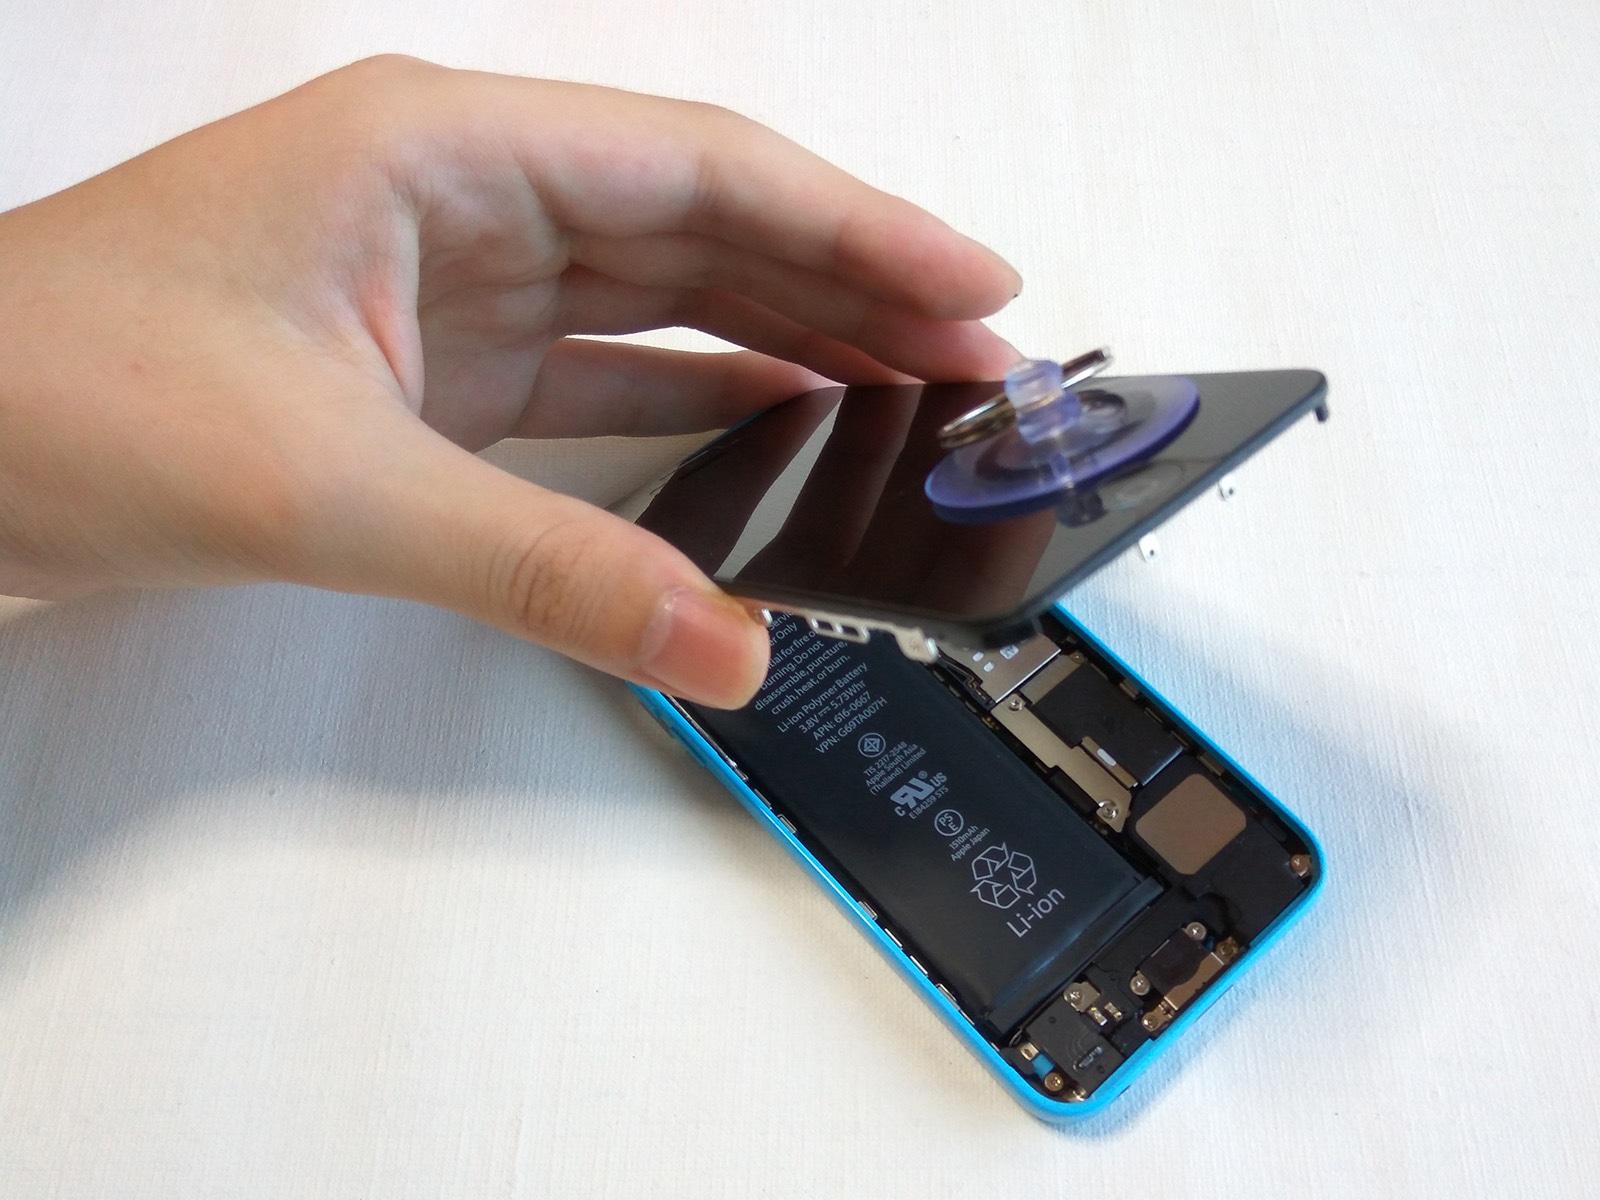 iPhone 5c バッテリー交換 開封